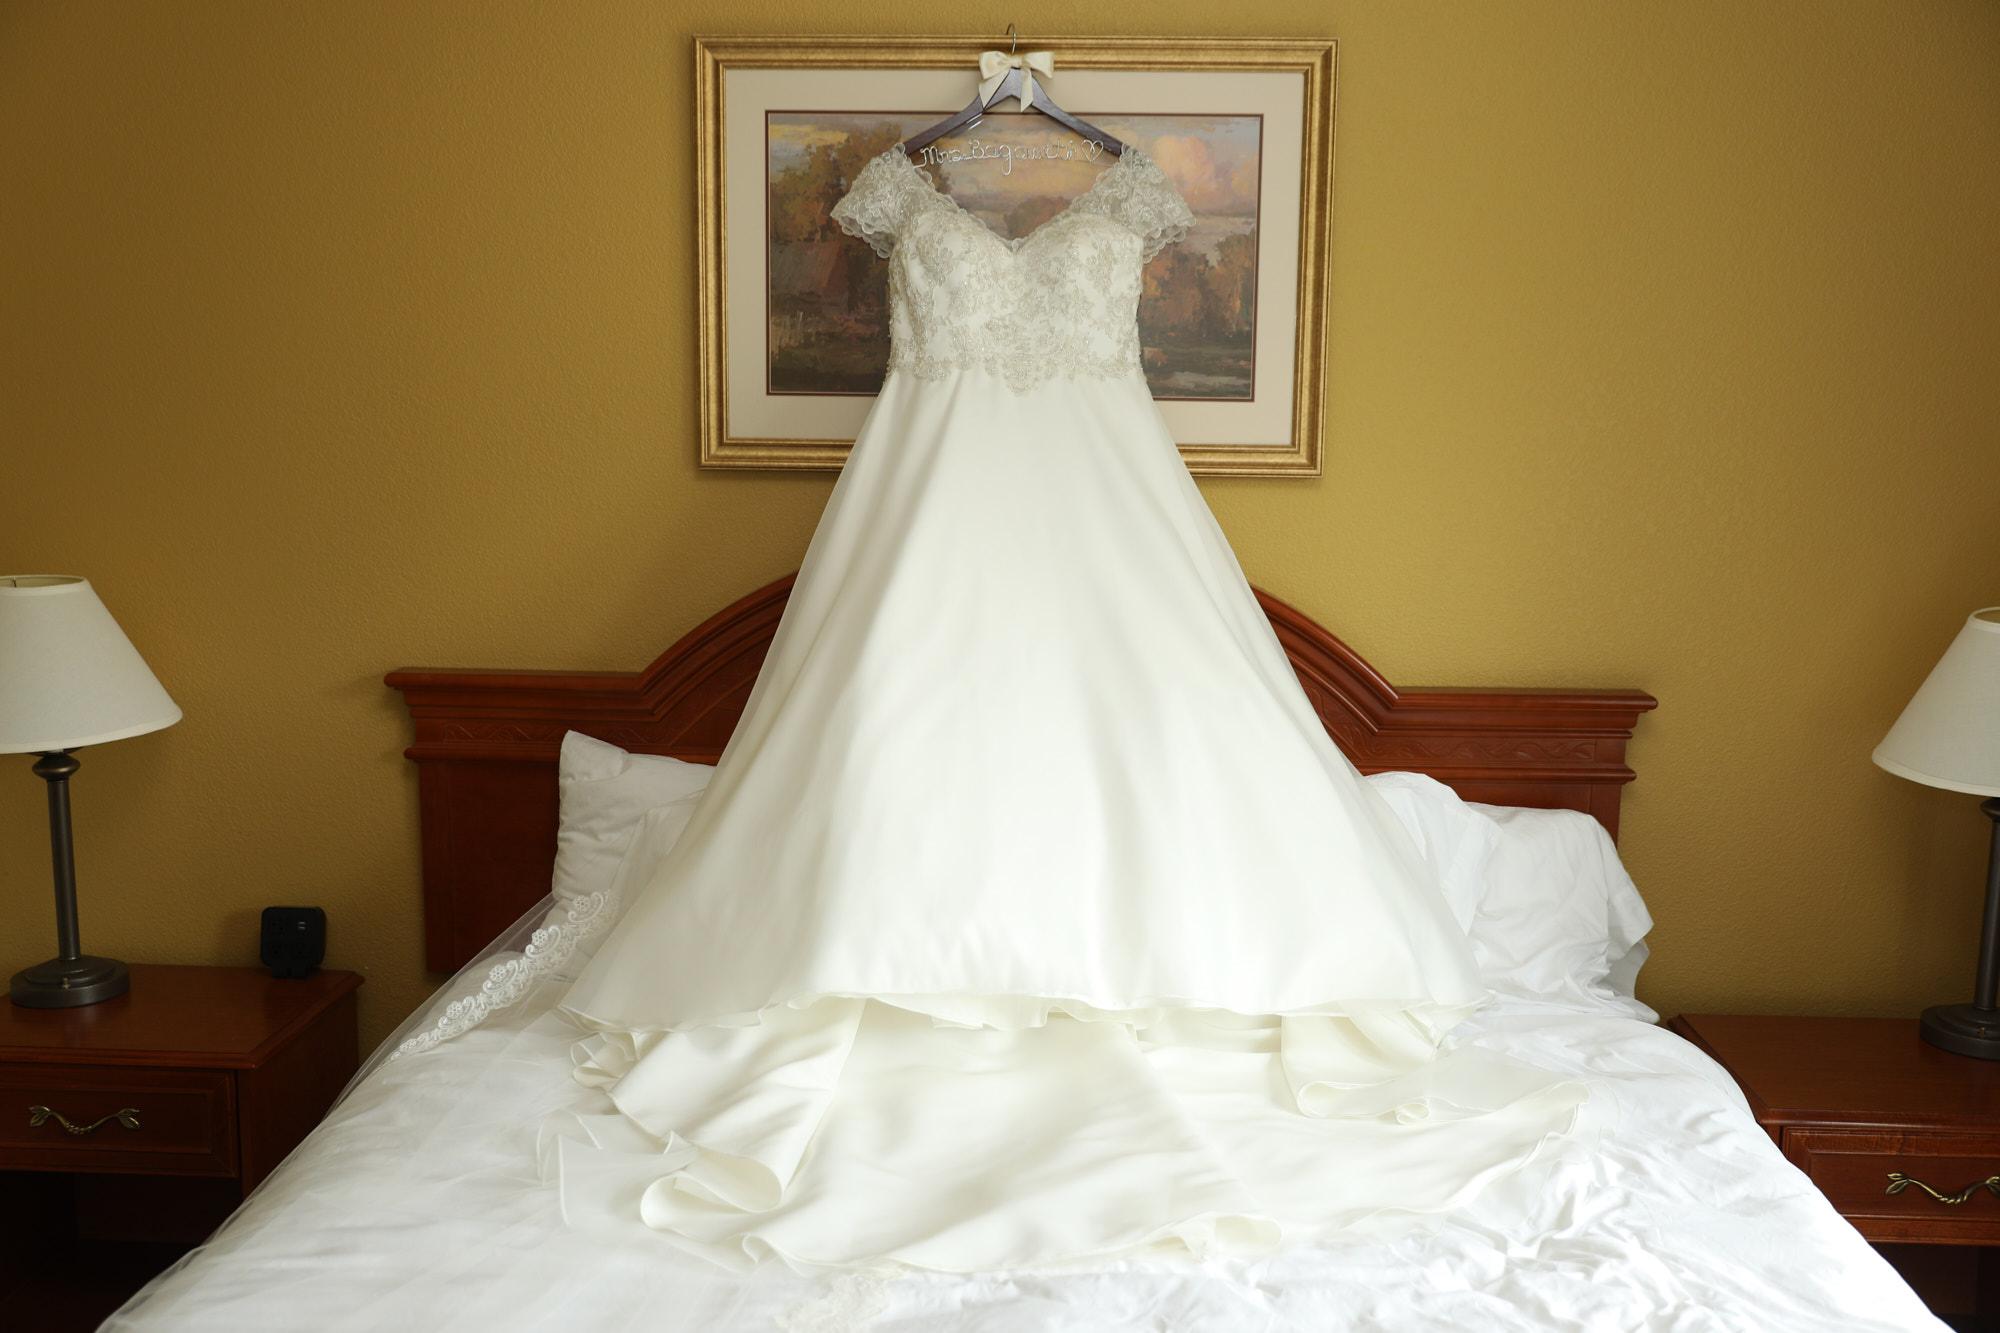 St Charles Borromeo Wedding and Heart of St Charles Reception Photos by St Louis Wedding Photographer Oldani Photography